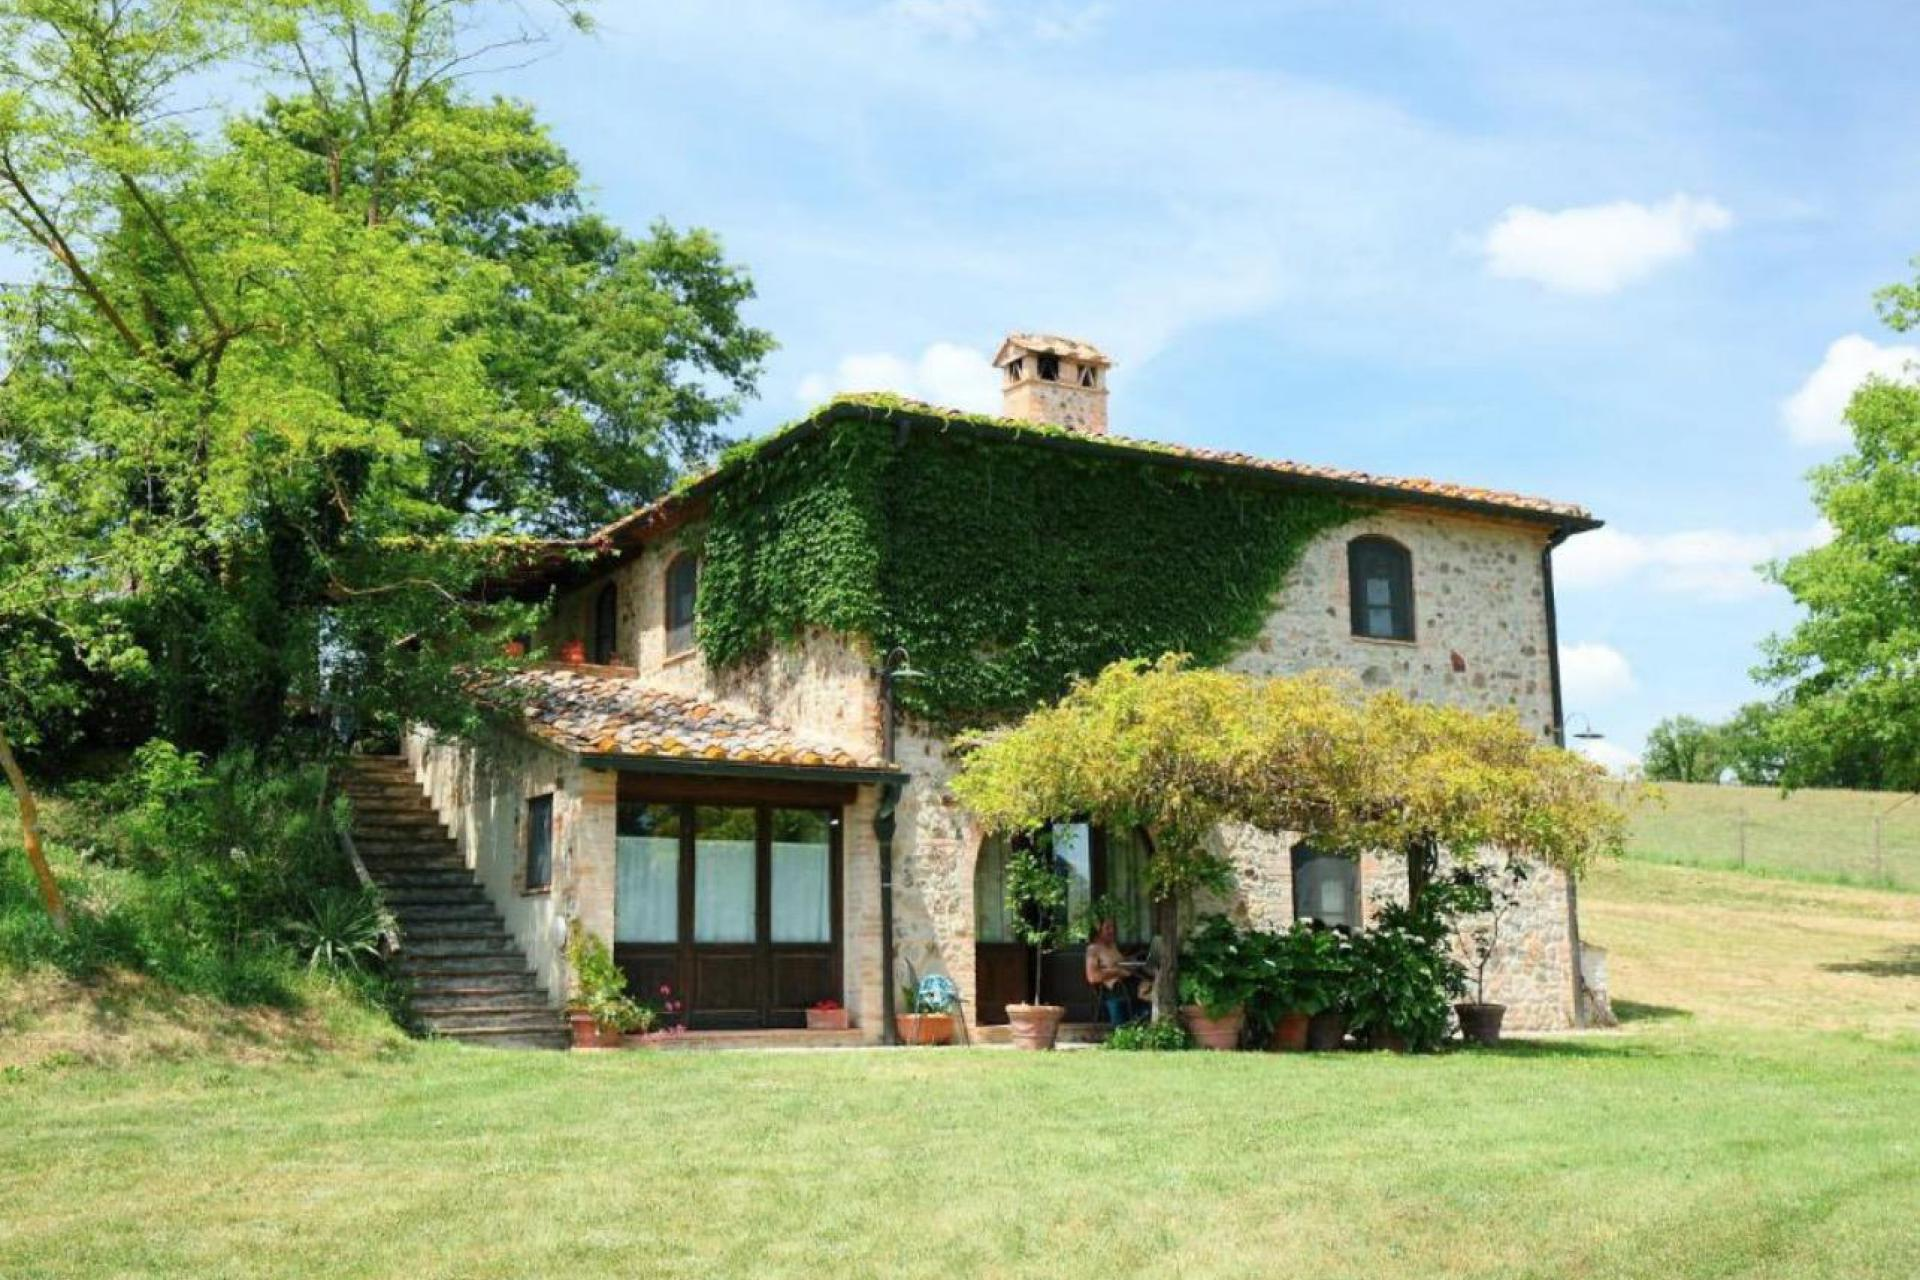 Agriturismo Toscane Twee landhuizen Toscane met privé-zwembad   myitaly.nl